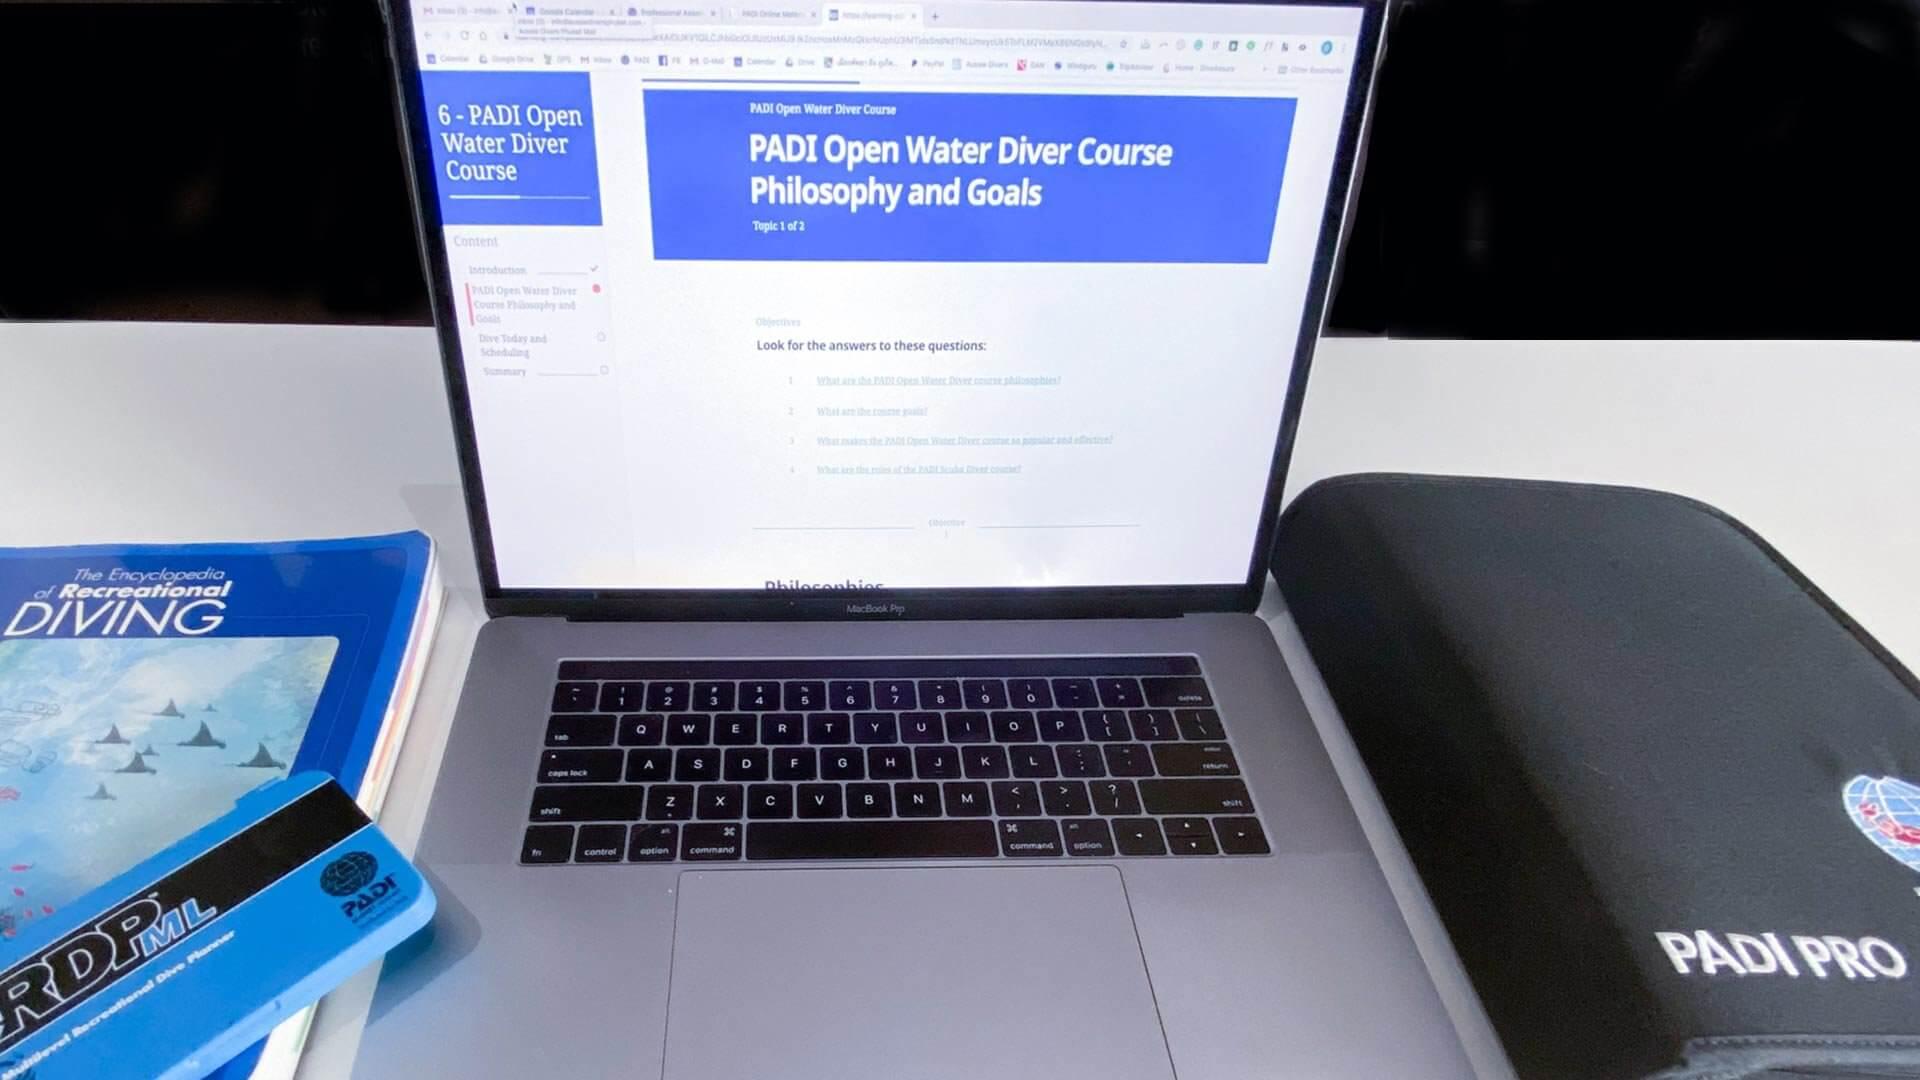 IDC Prior Learning & PADI IDC Online